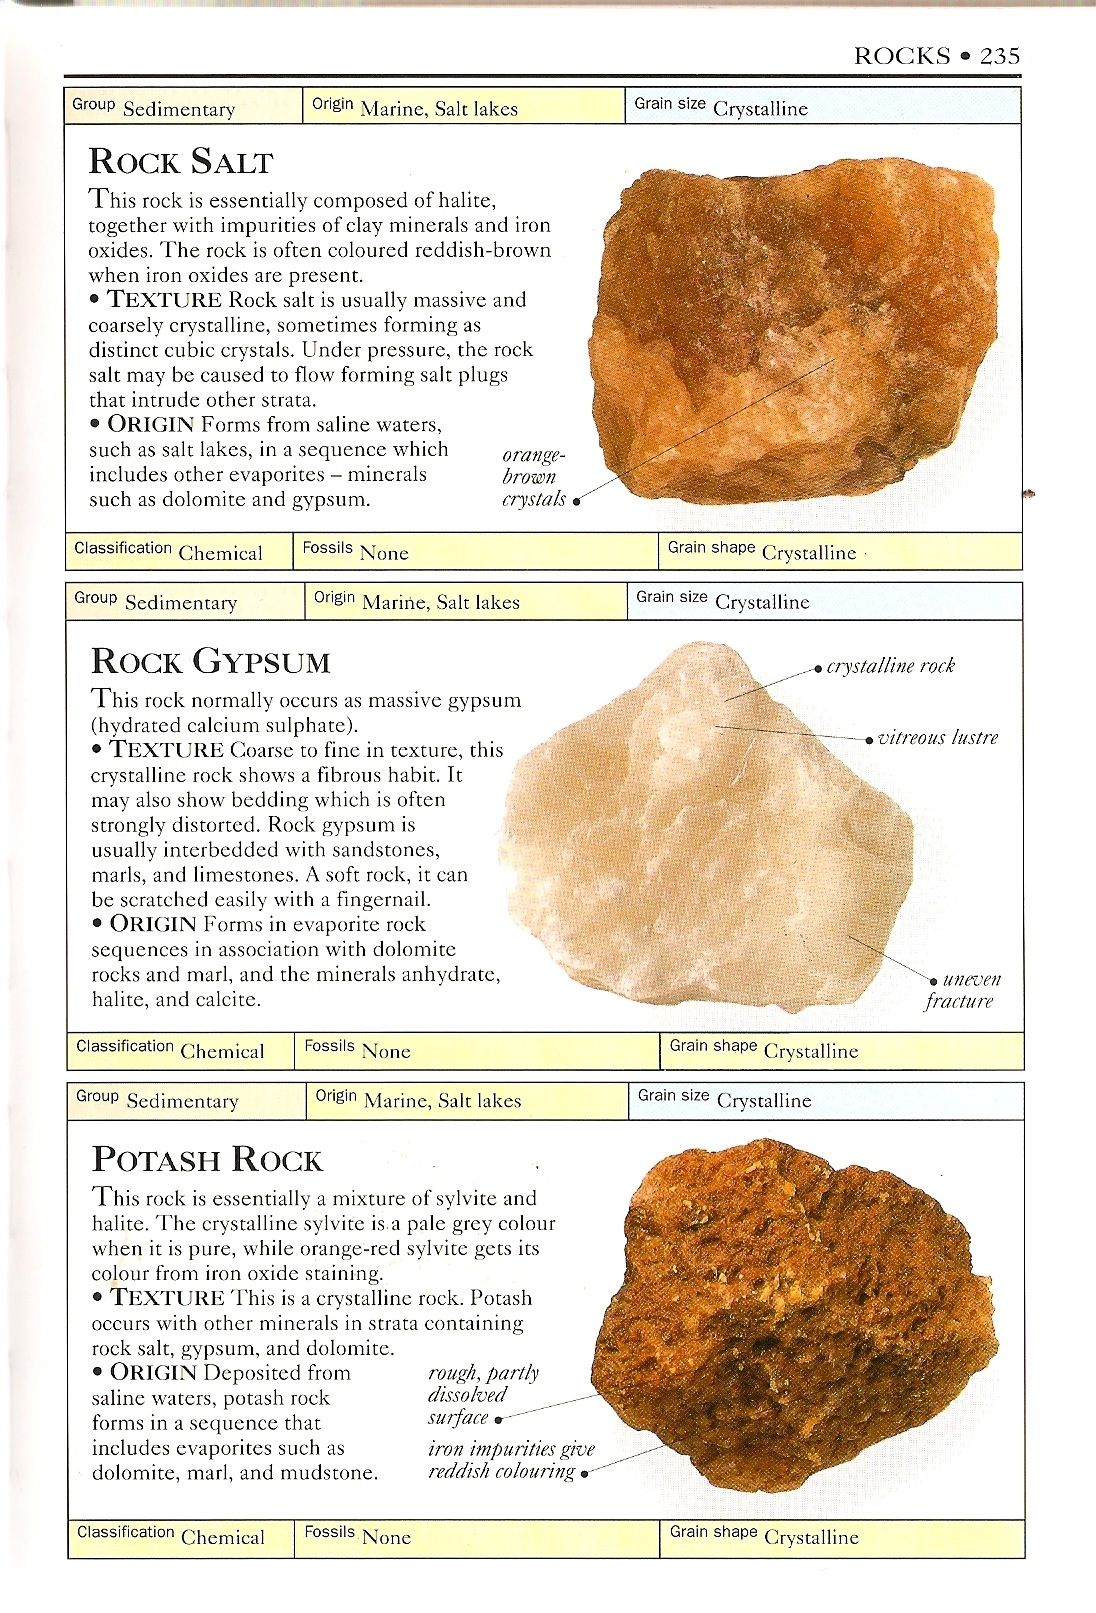 Gypsum Potash Salt Rocks And Minerals Minerals Rocks And Crystals